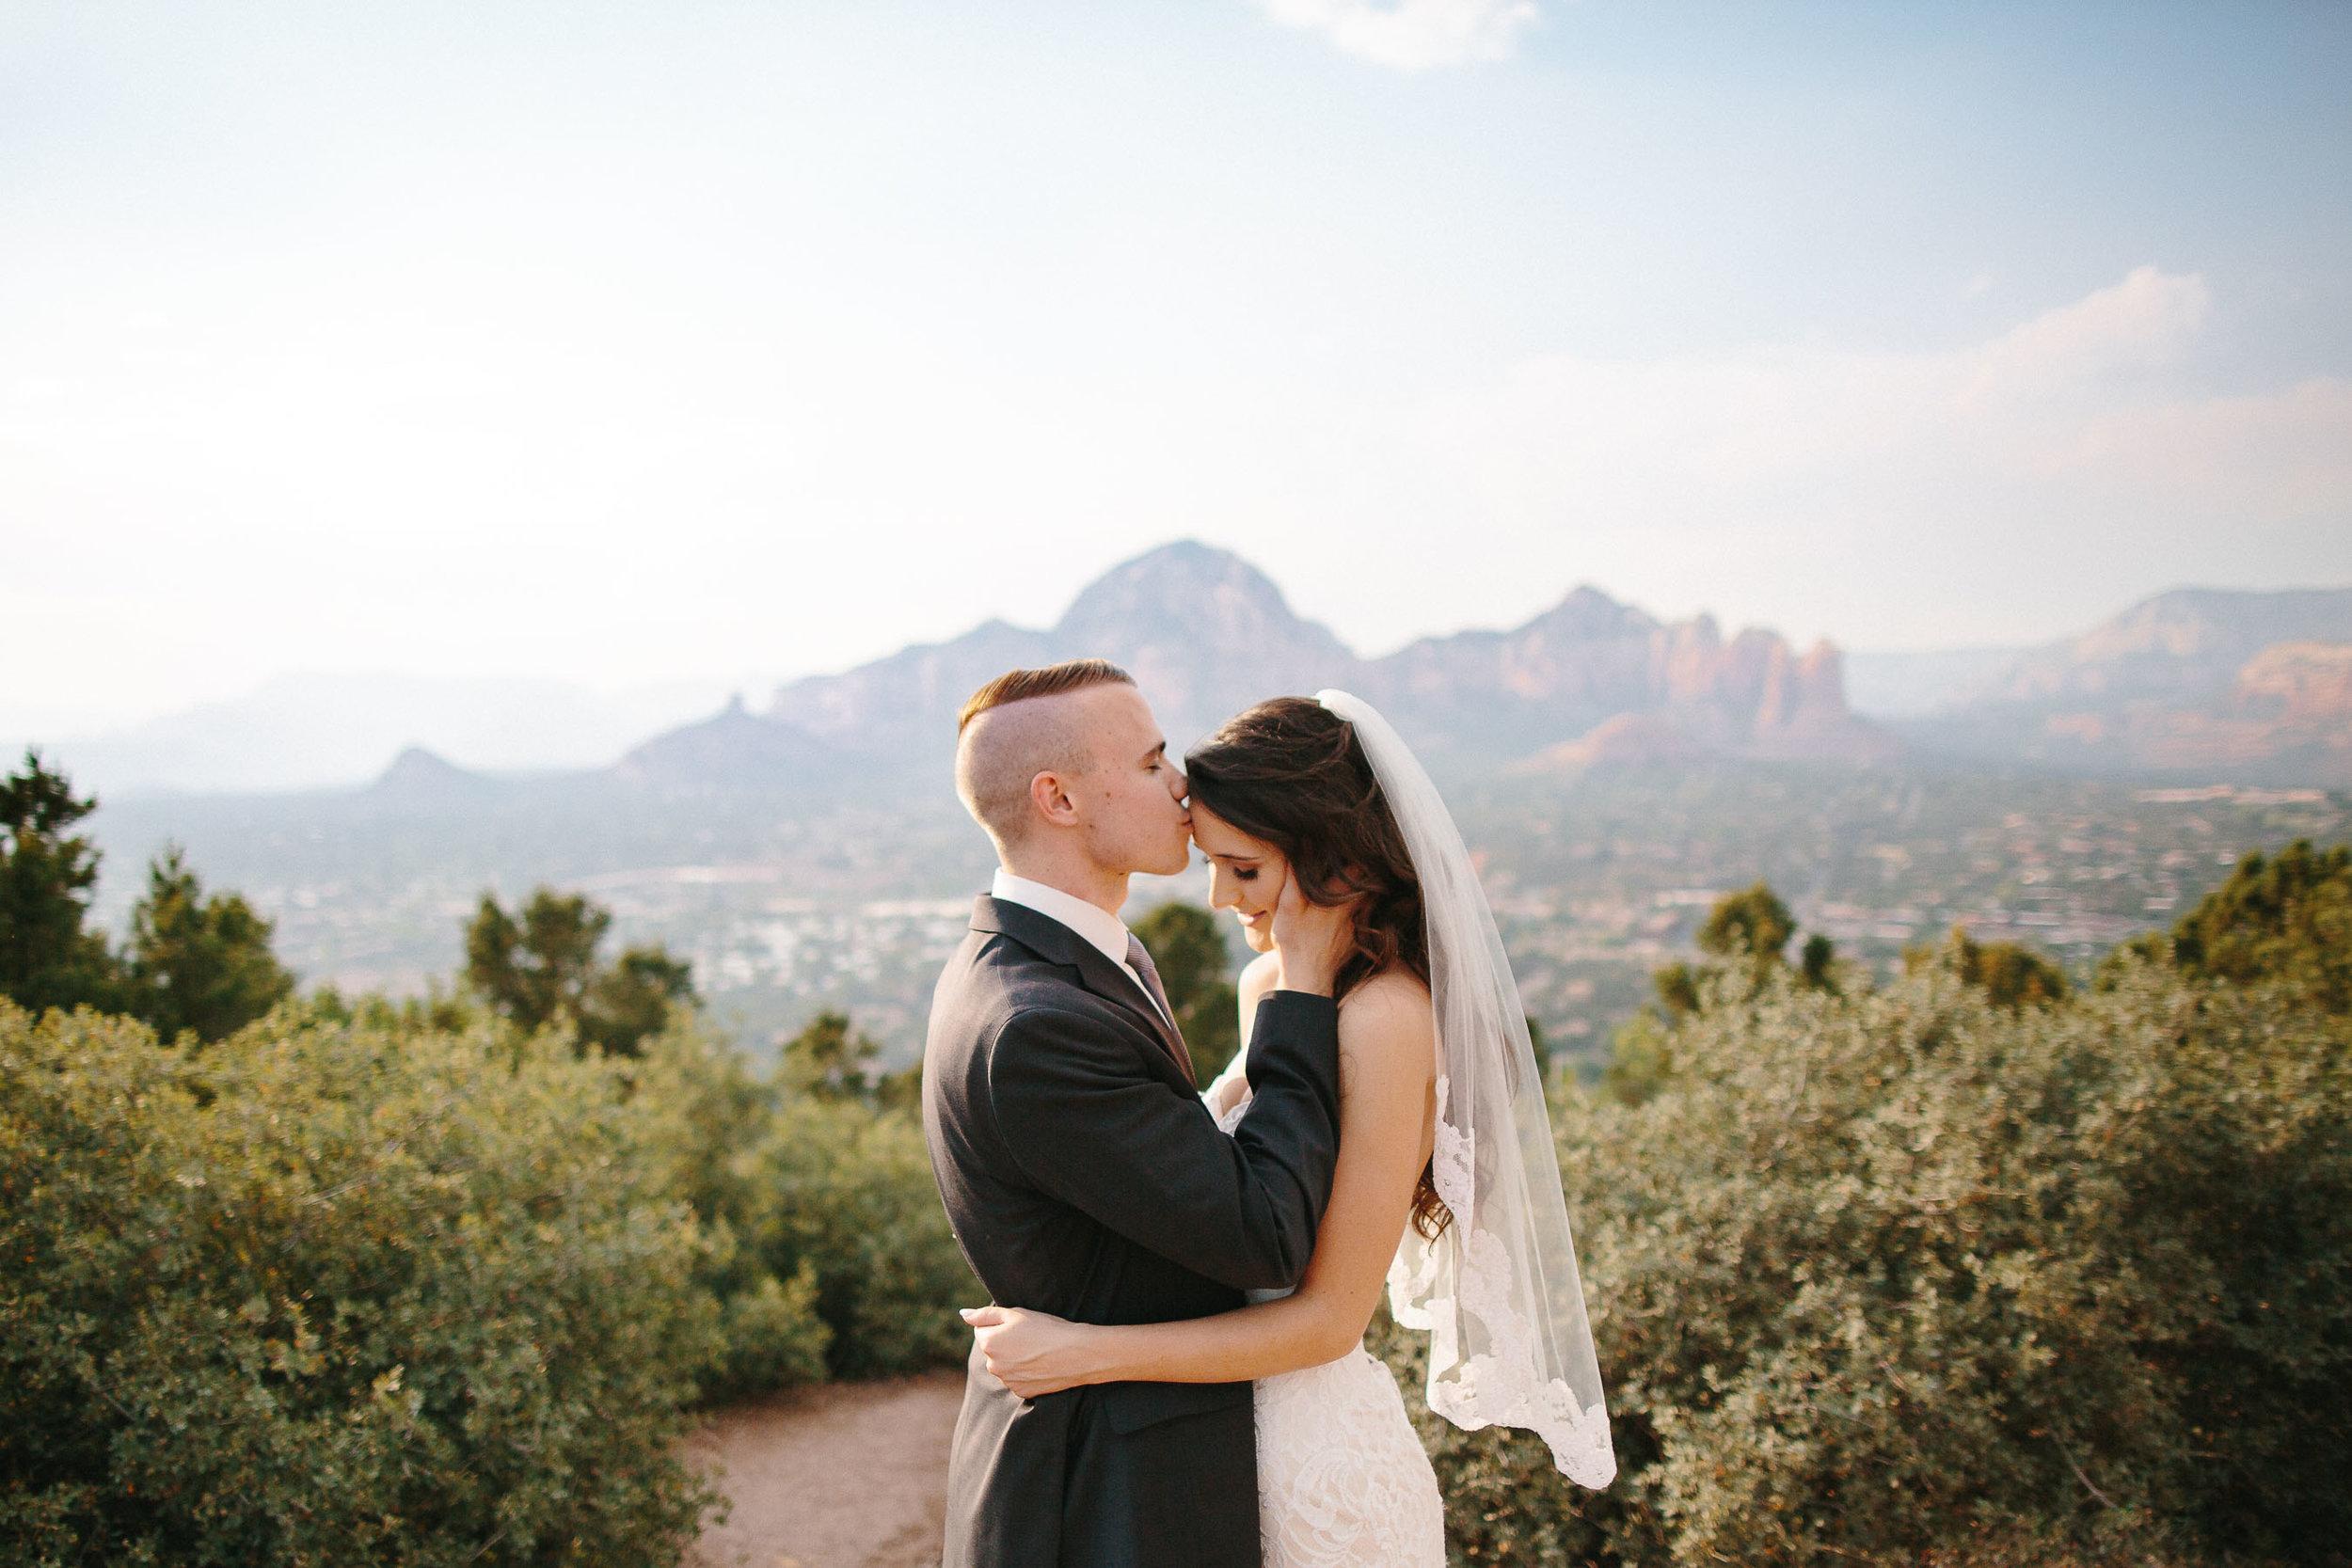 170528-Luxium-Weddings-Arizona- Sedona-Sky-Ranch-Lodge-Squarespace-2744.jpg